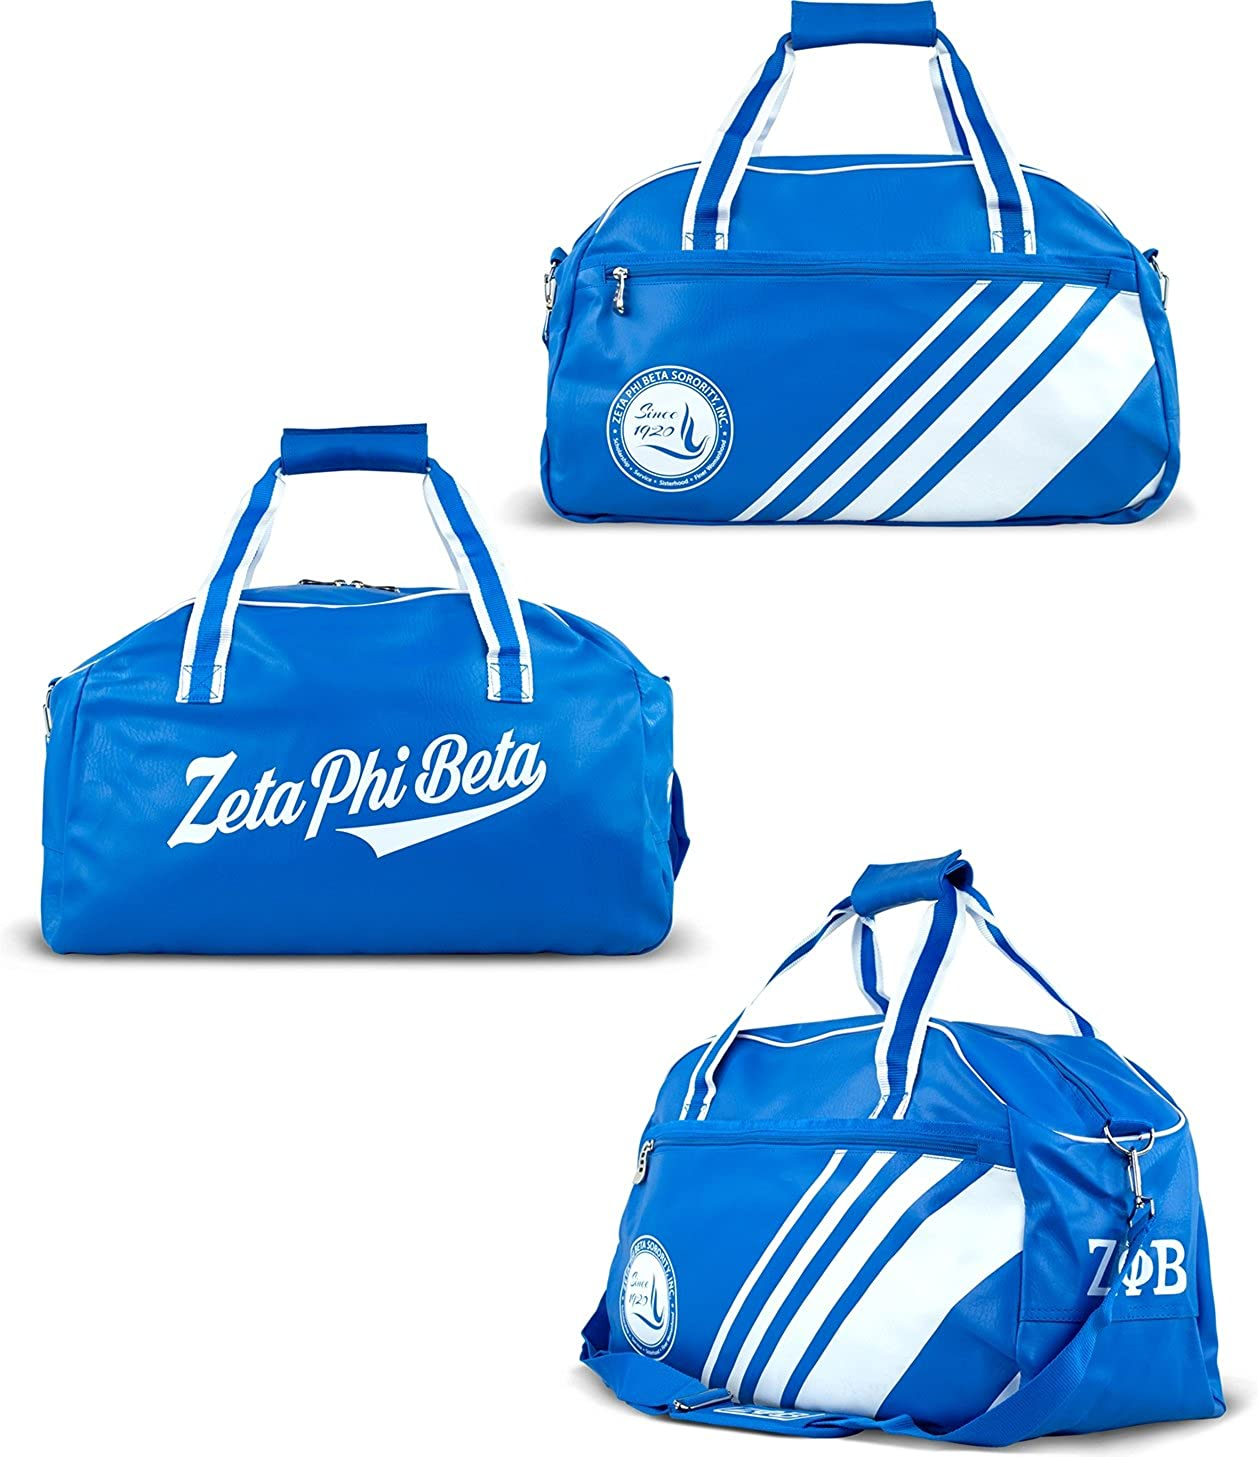 Big boy zeta phi beta divine pu leather duffle bag royal blue jpg 1258x1457 Duffle  bag 0a6bf13a423e9